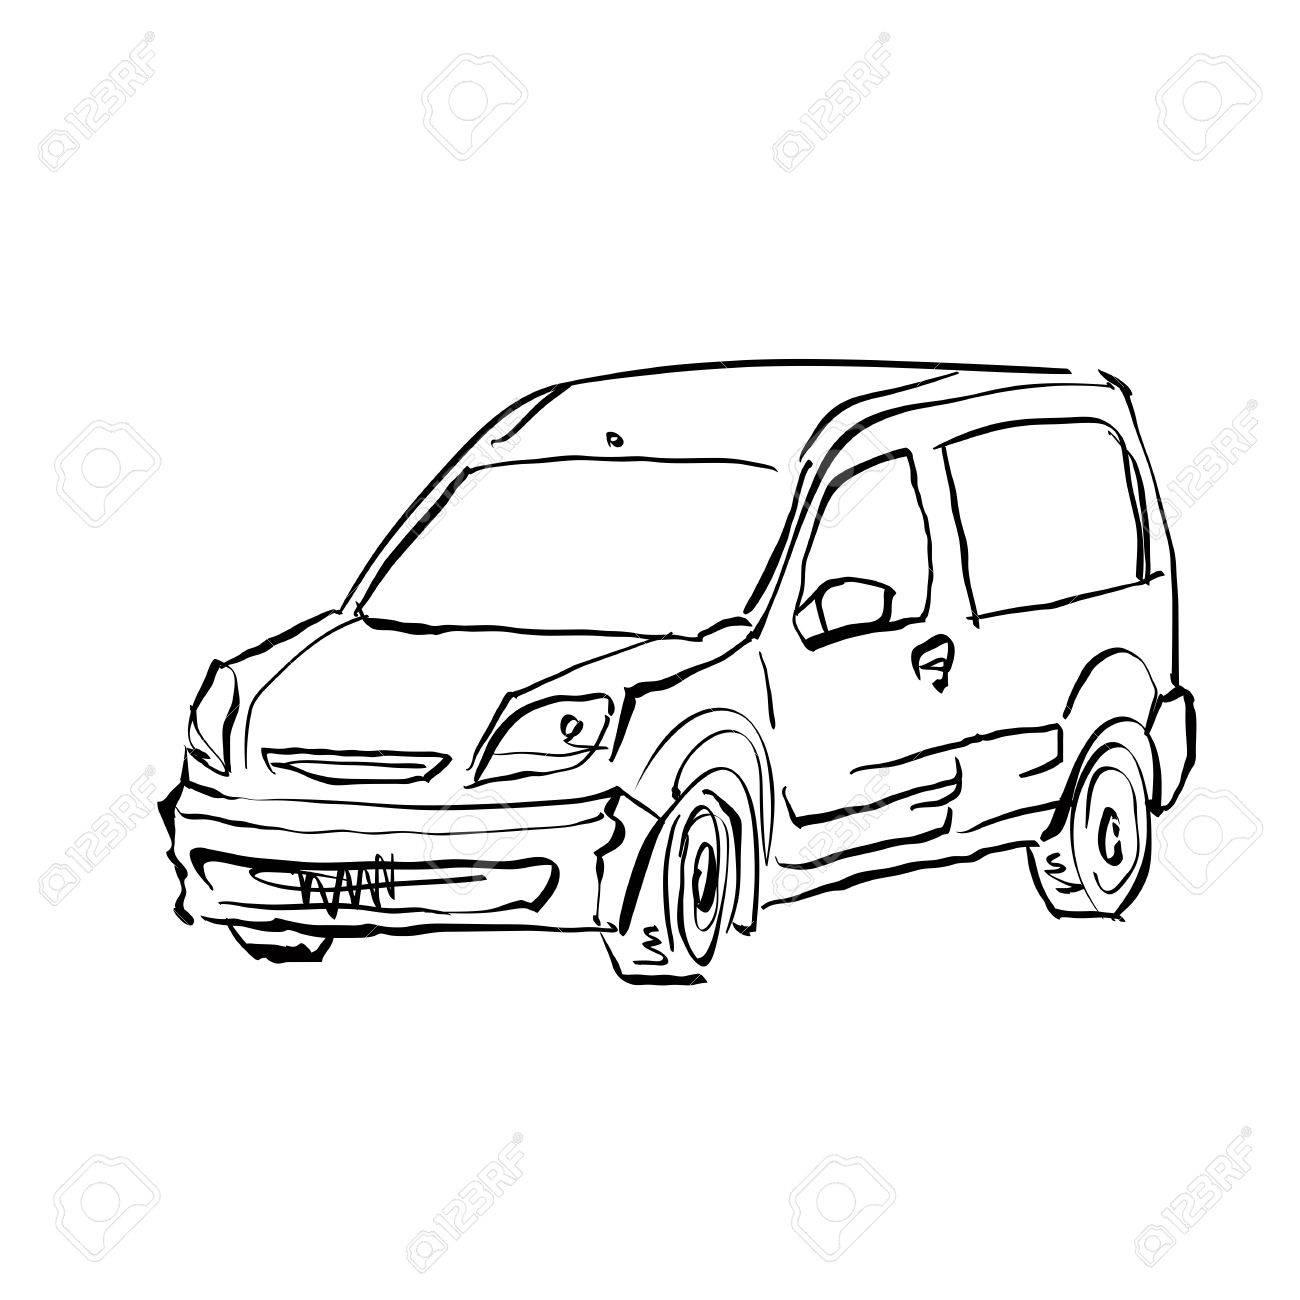 1300x1300 black and white hand drawn car on white background illustration